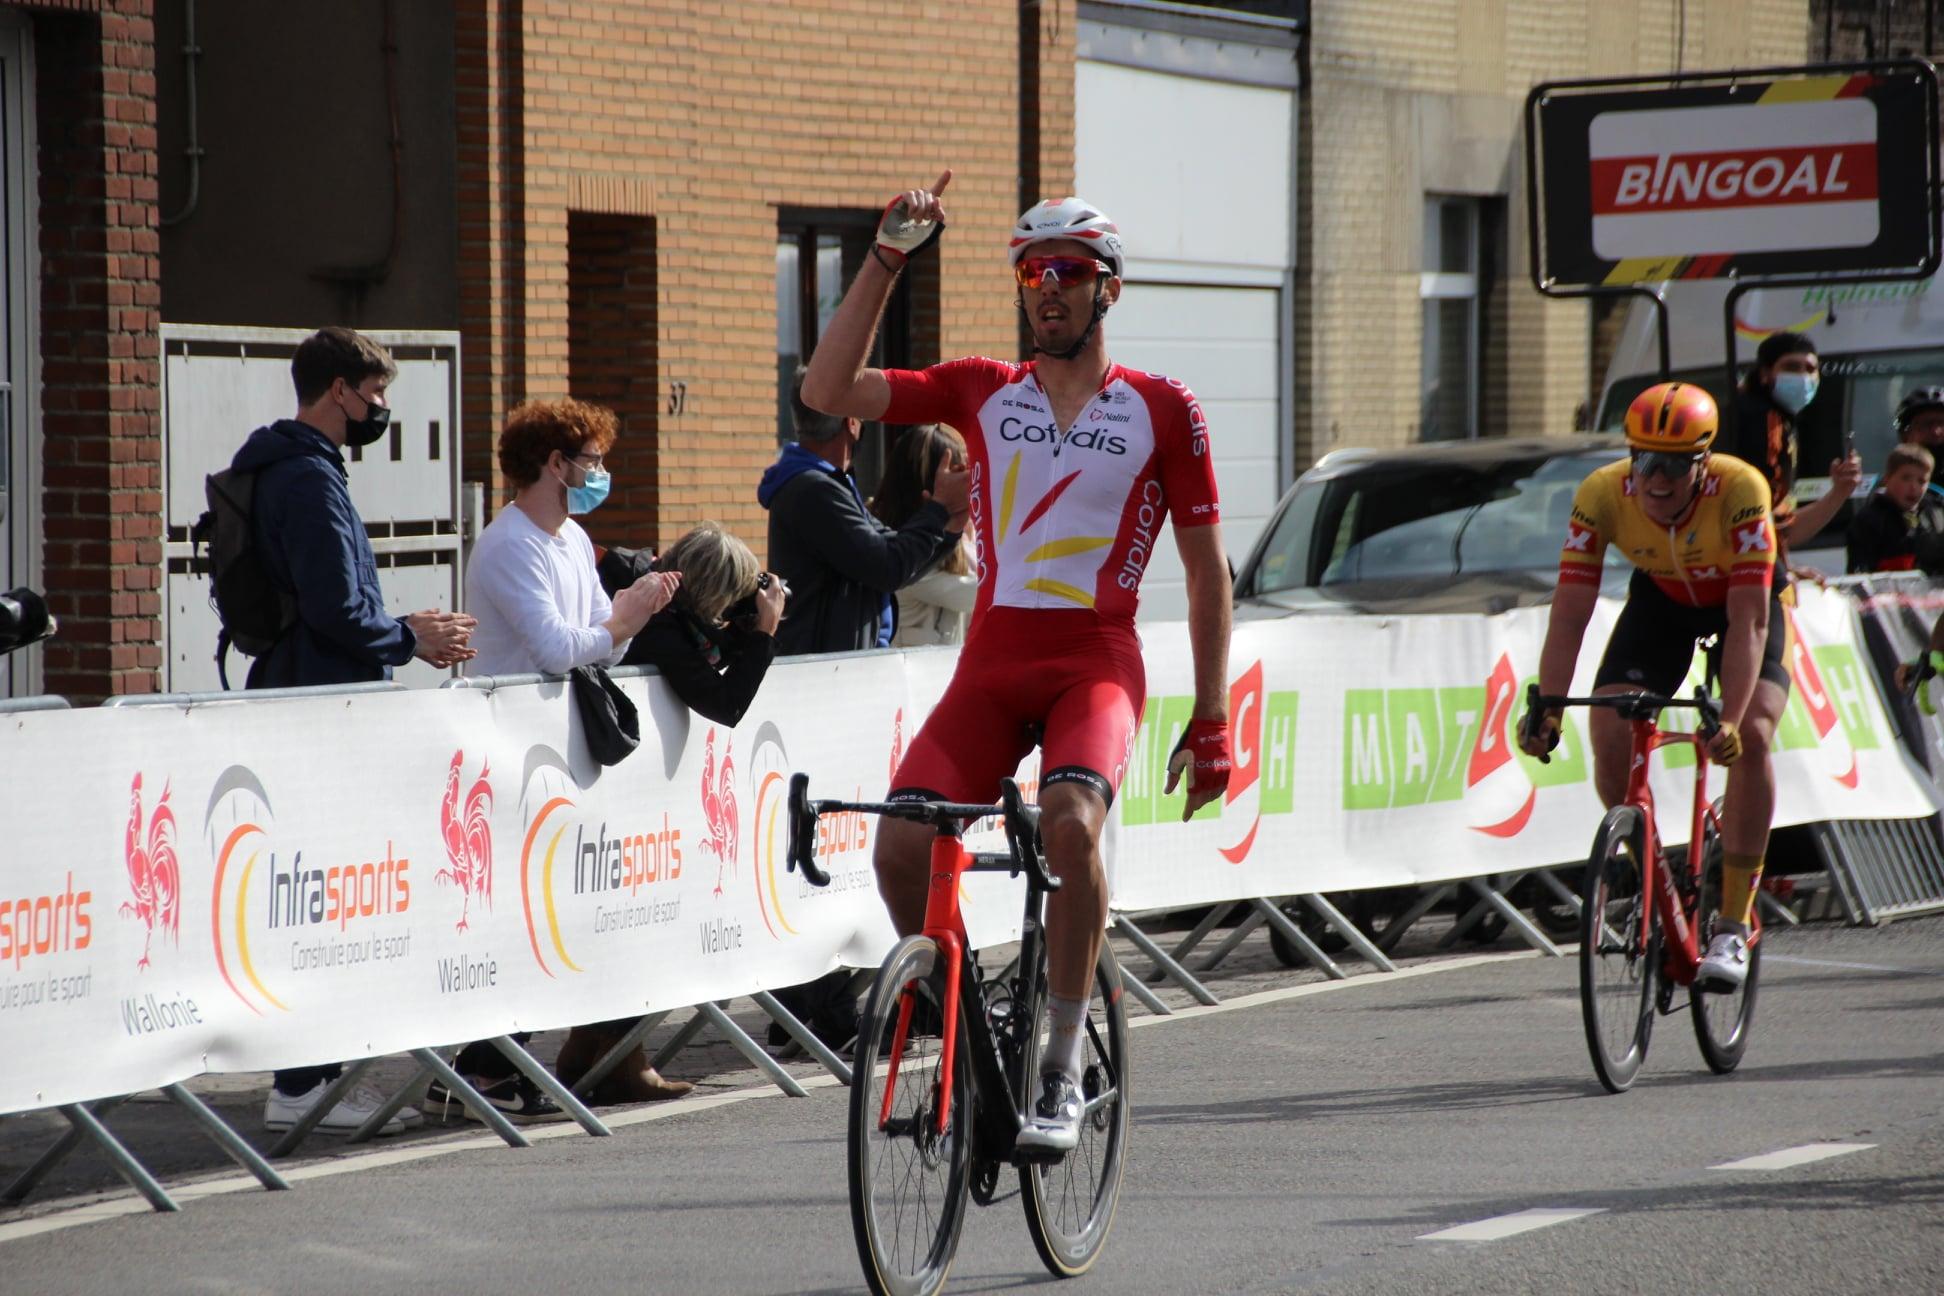 Laporte e Vleuten triunfam em Wallonie e Navarra!